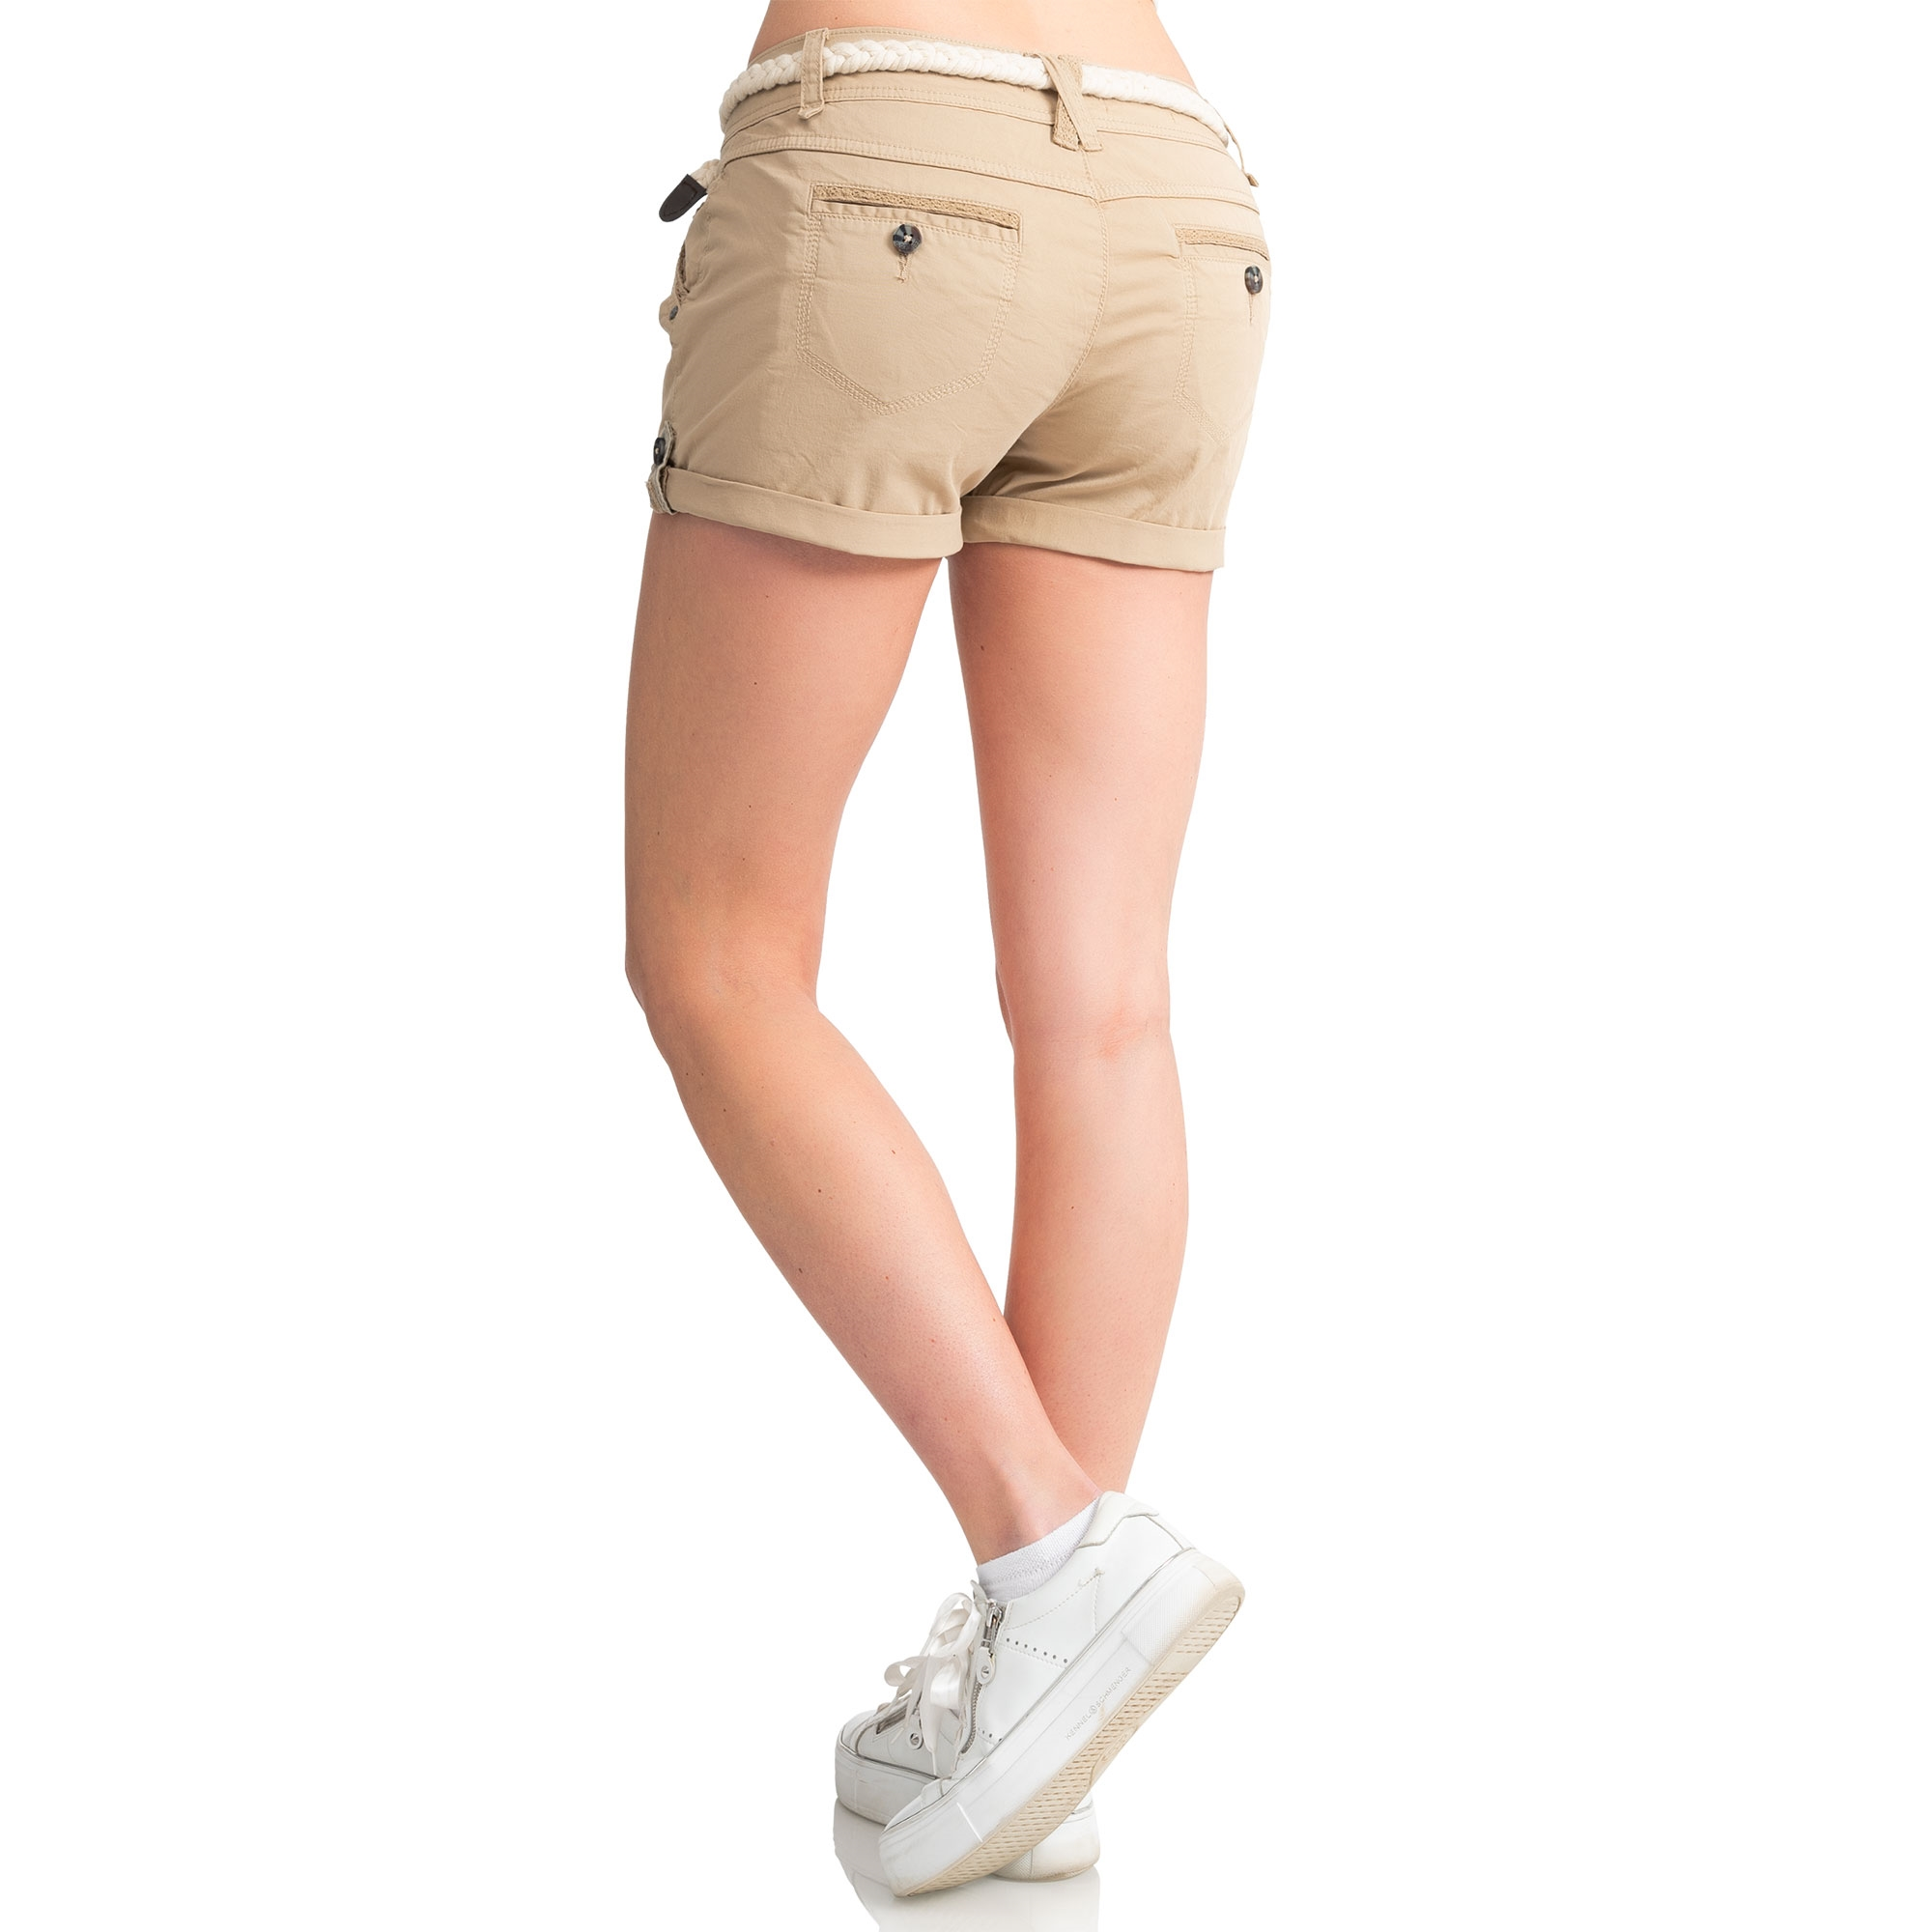 Indexbild 23 - Eight2Nine Damen Chino Bermuda Stretch Shorts mit Flecht Gürtel Hotpants